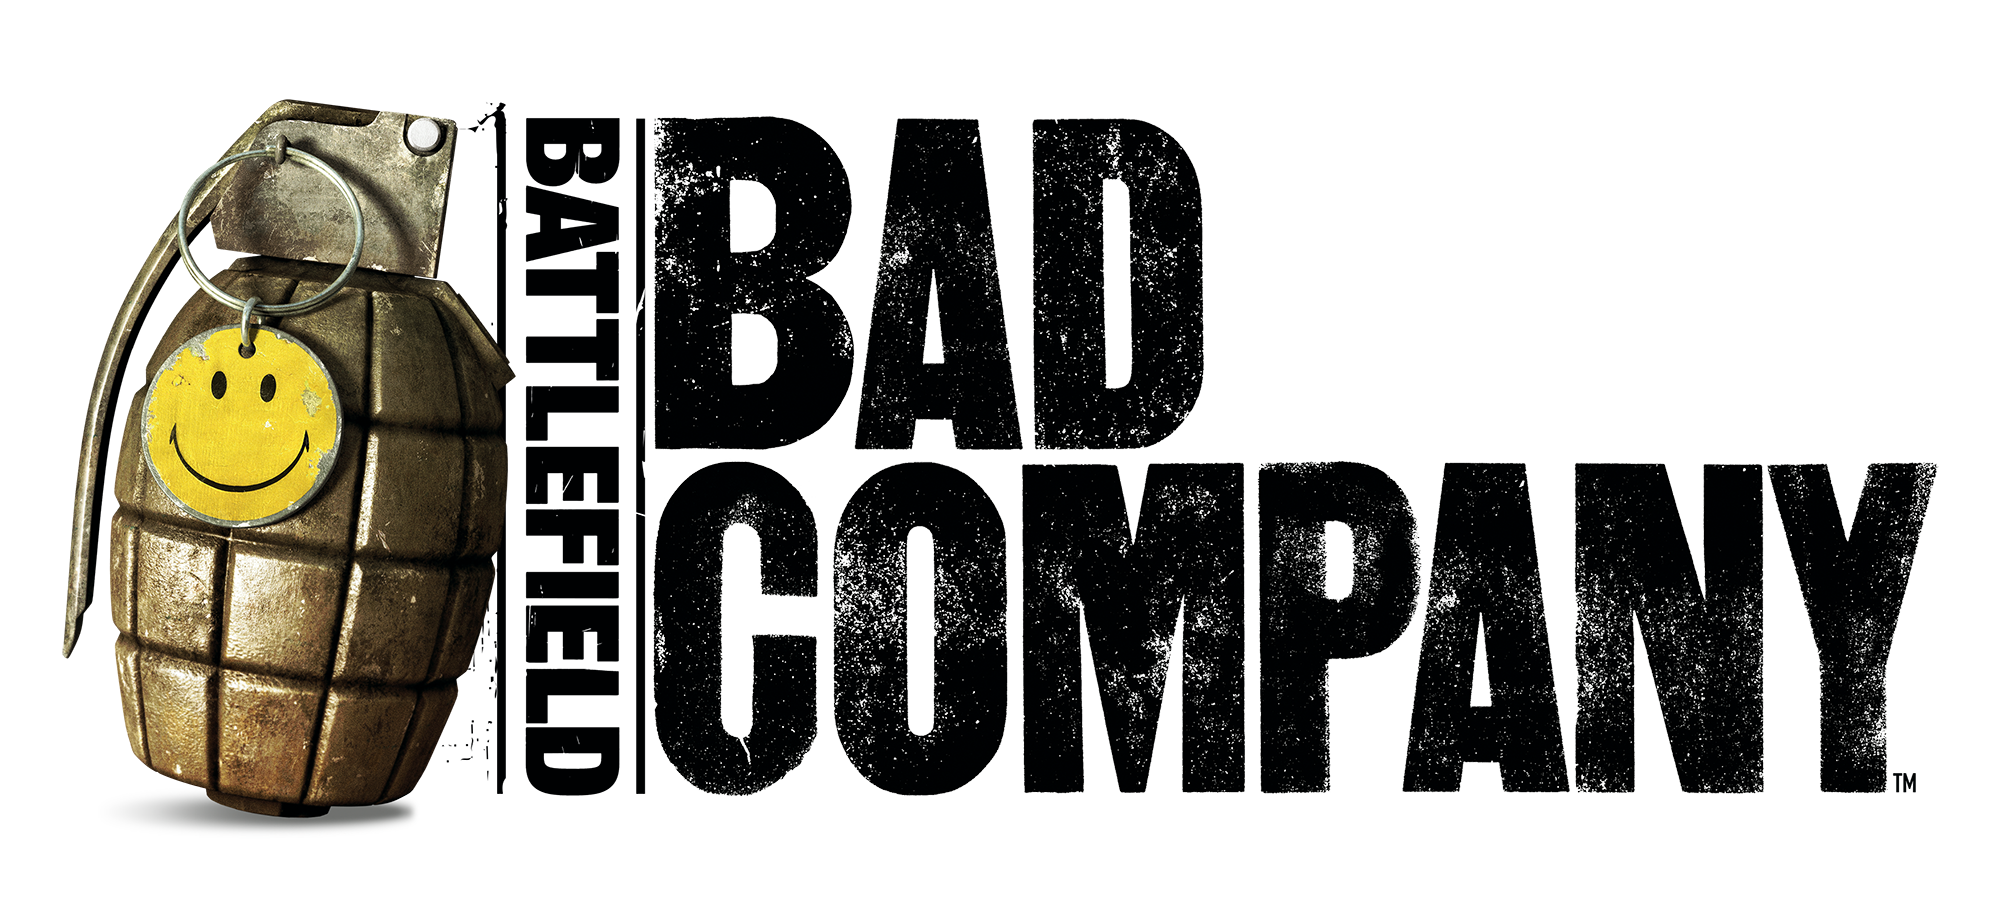 Battlefield Bad Company Dice Ideias De Tatuagens Jogos